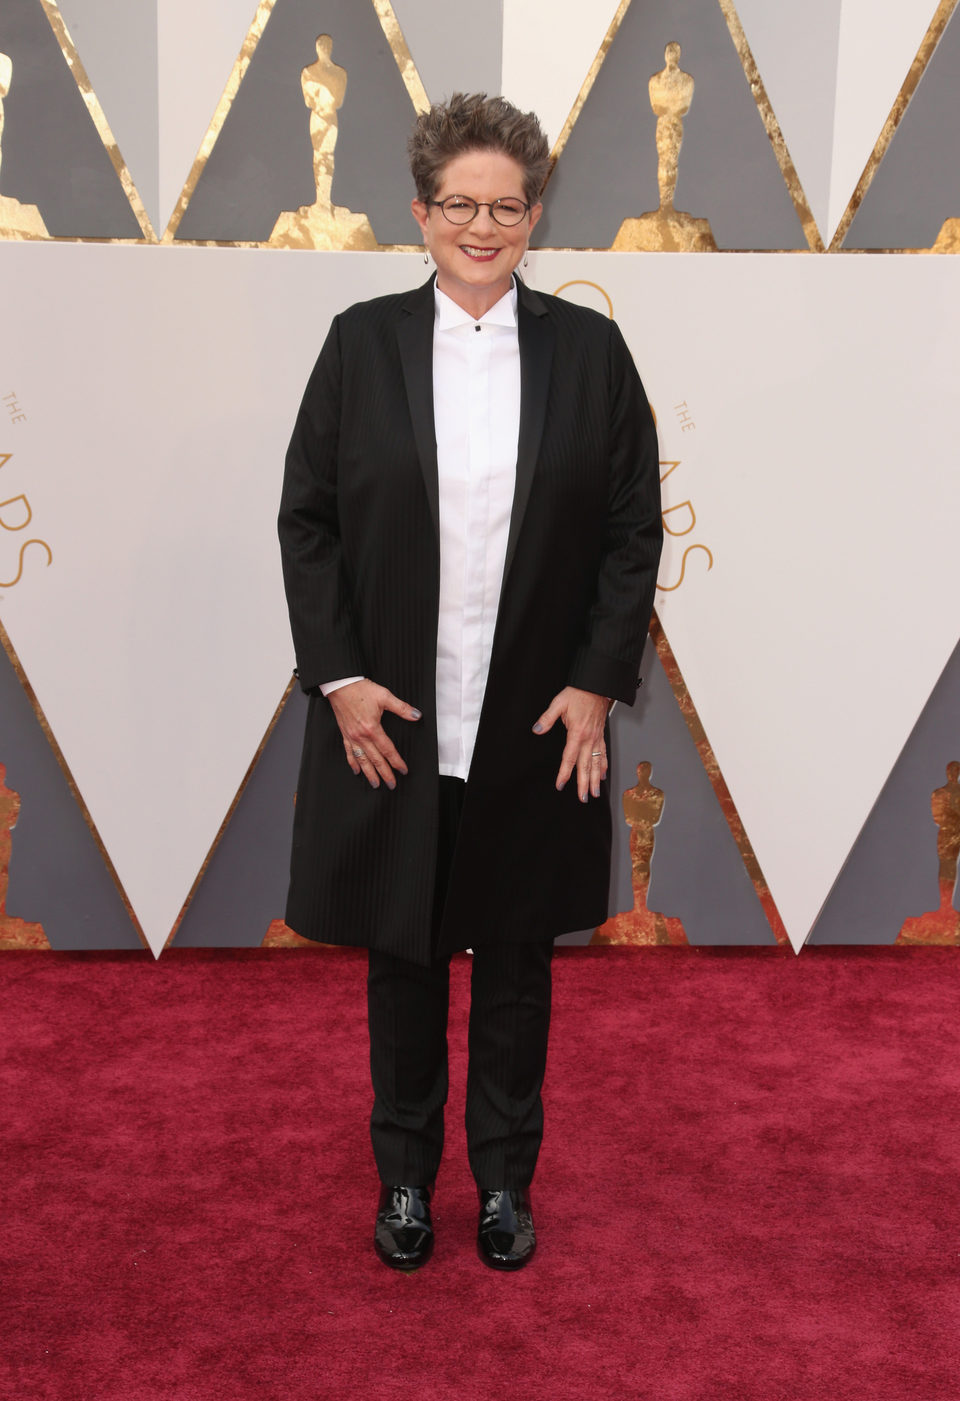 Phyllis Nagy at the Oscars 2016 red carpet